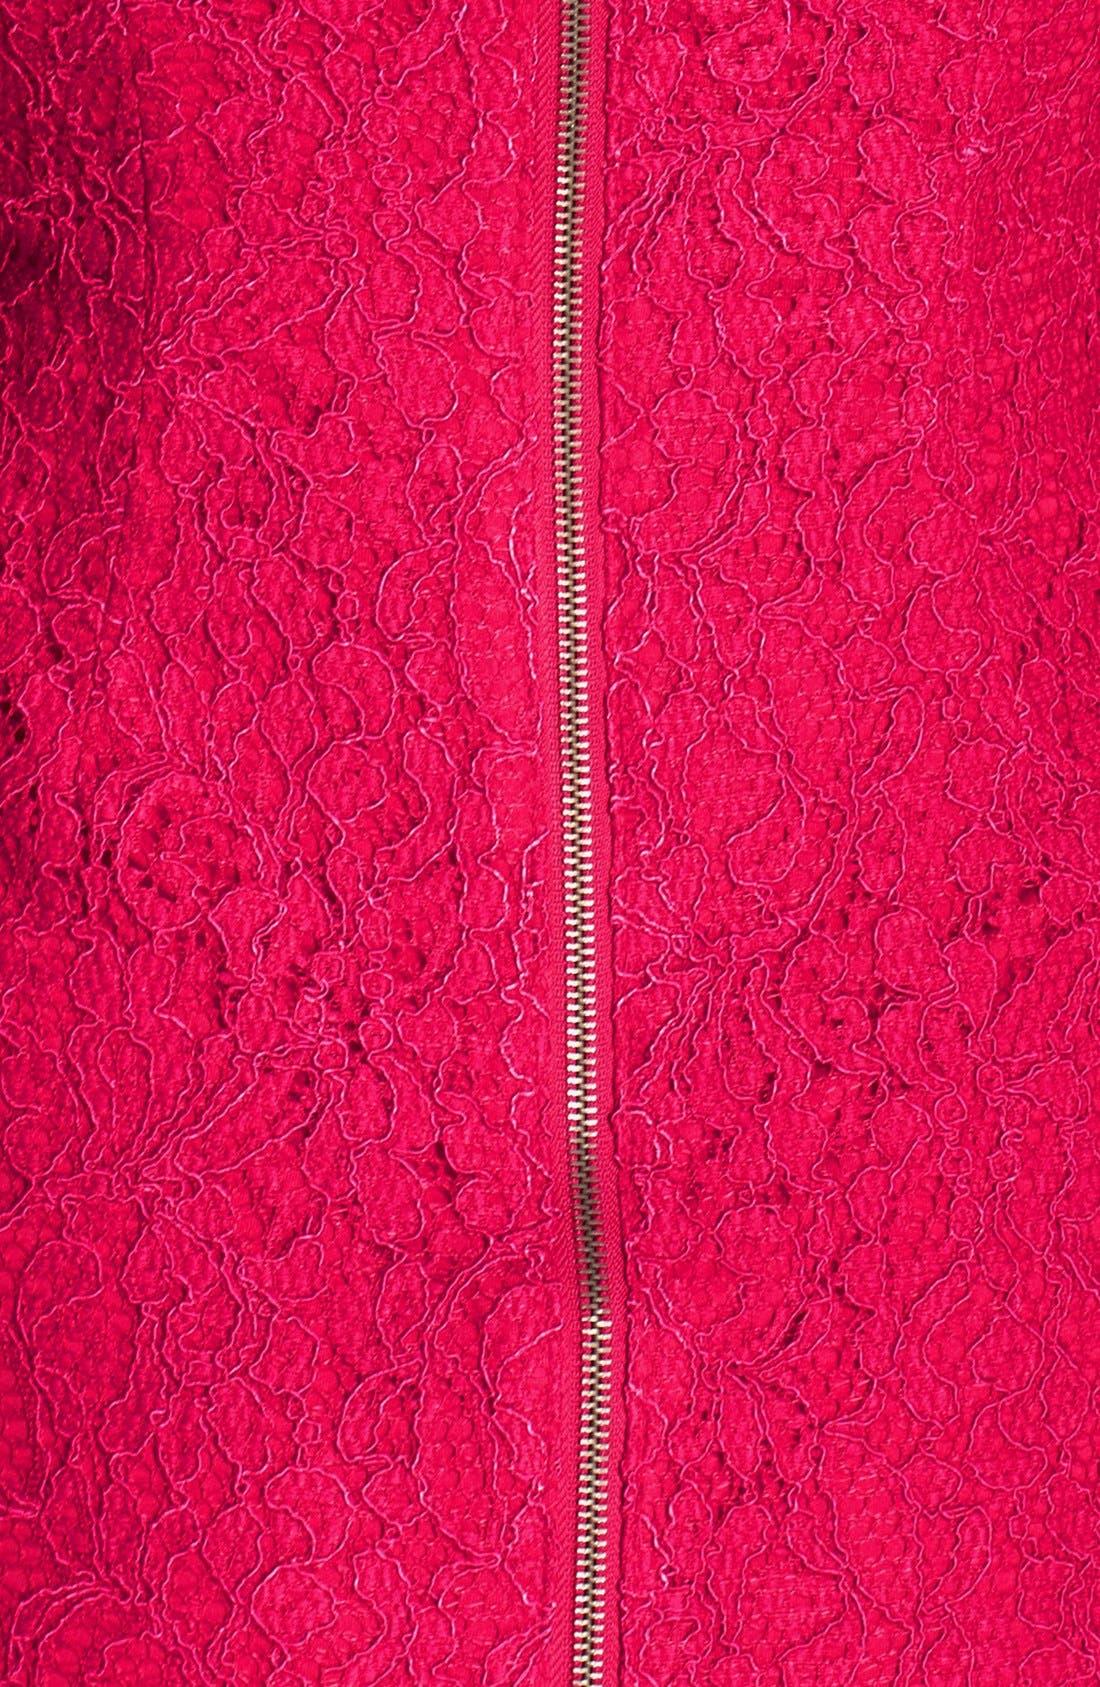 Boatneck Lace Sheath Dress,                             Alternate thumbnail 88, color,